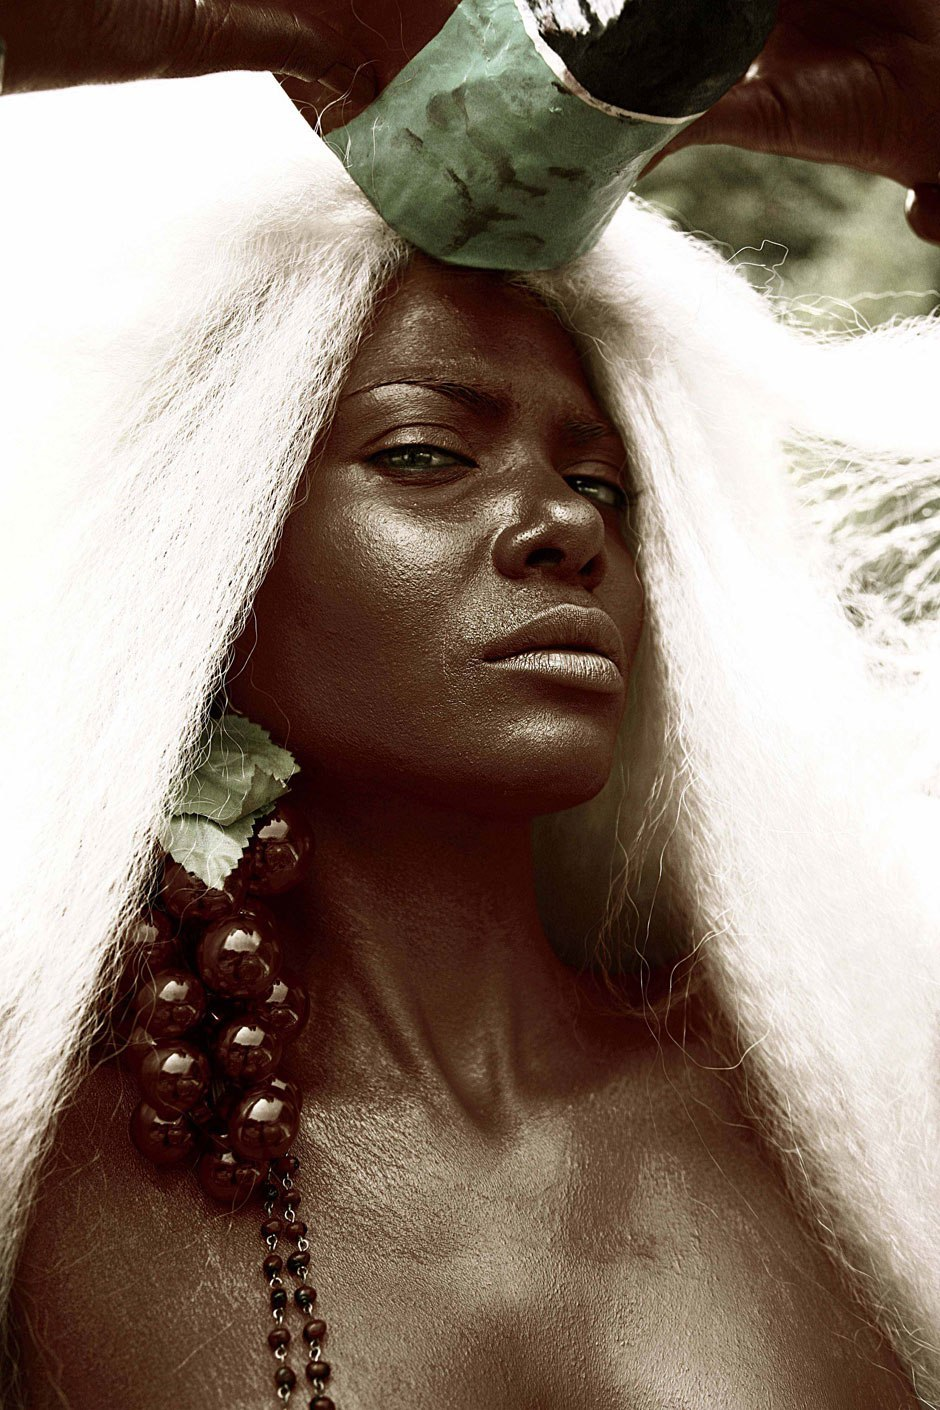 'Africa' by Daniel Bracci (7).jpg